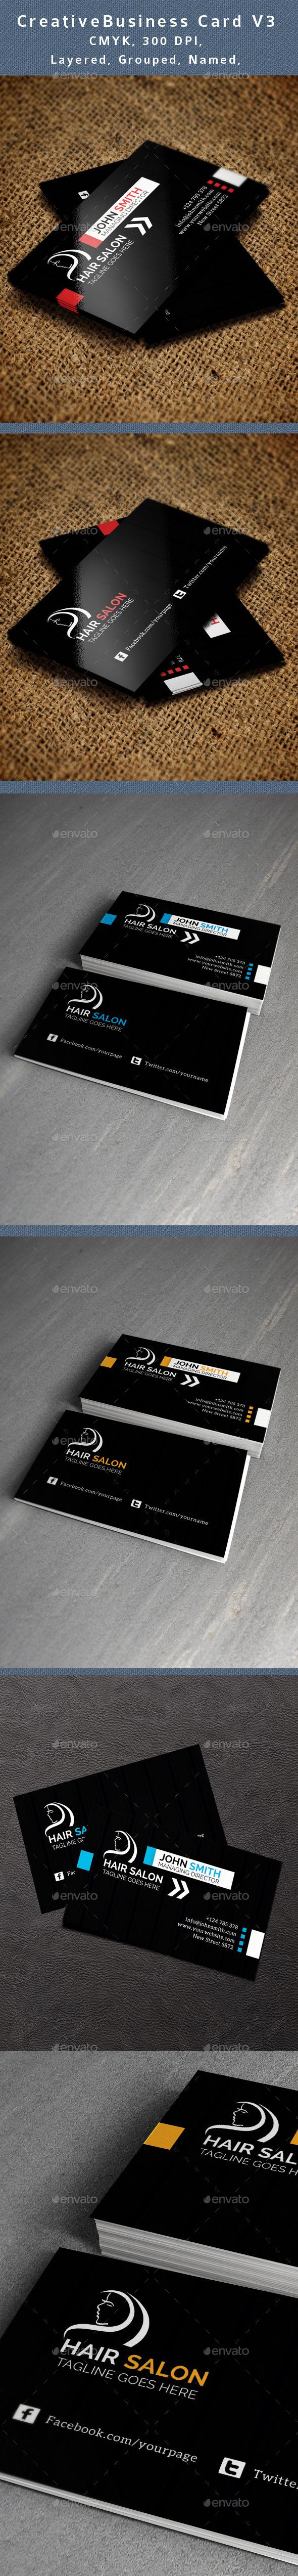 Hair Salon Business Card Graphics Designs Templates